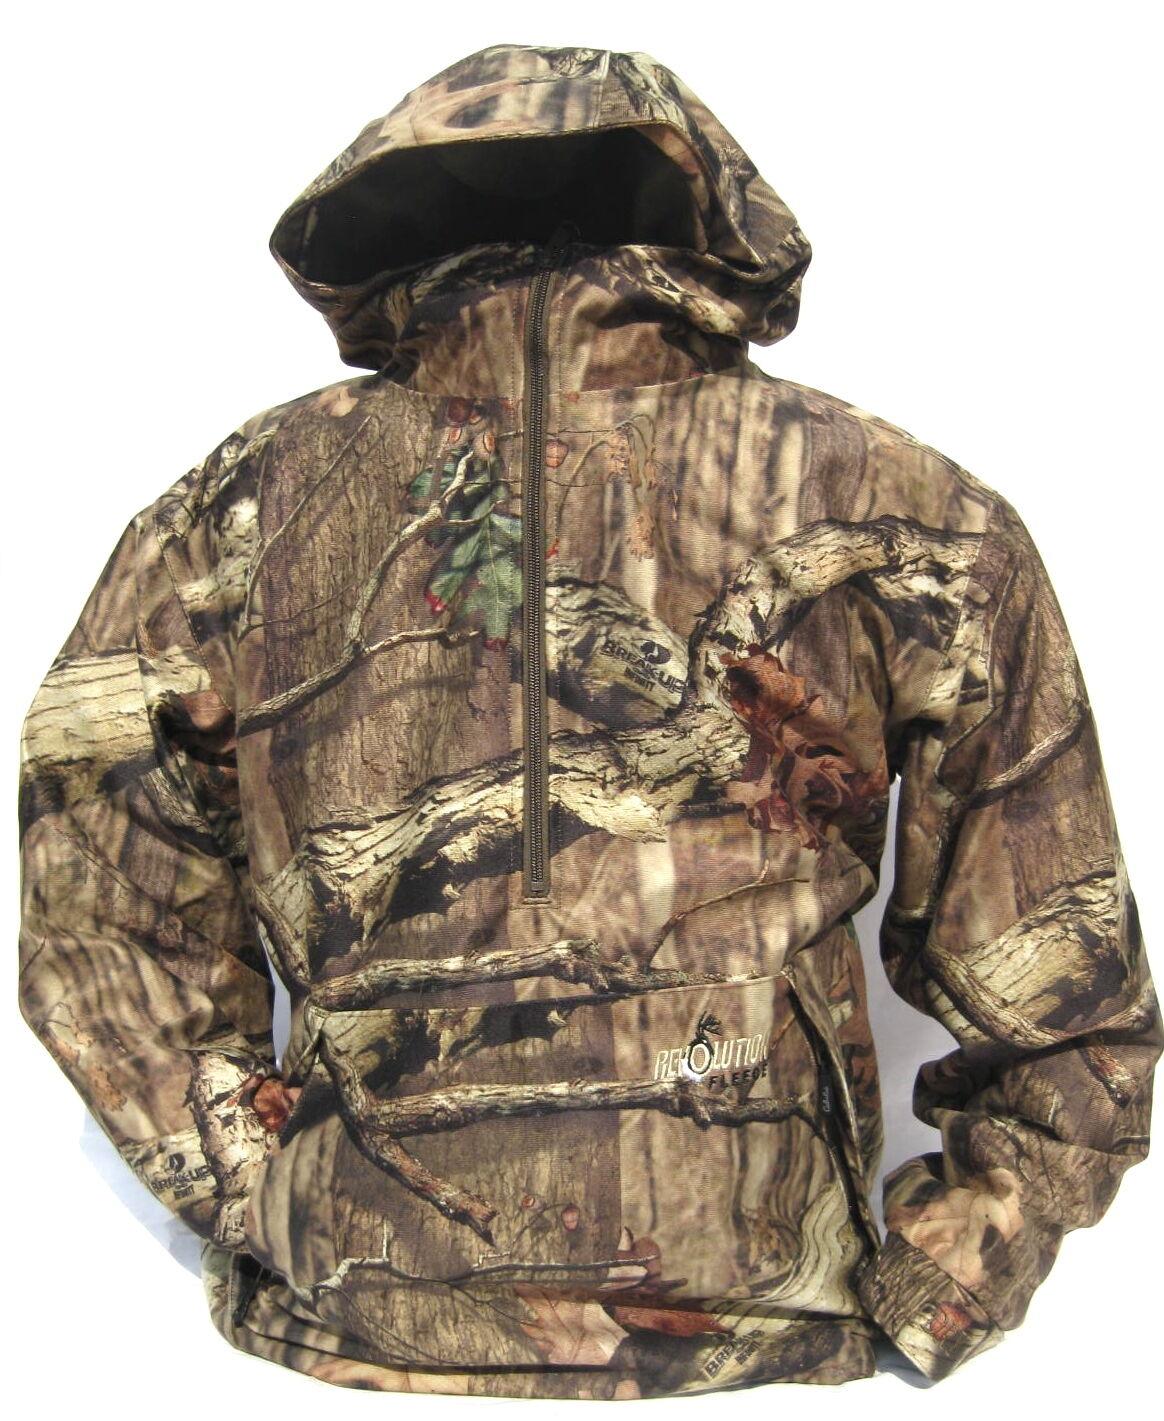 Cabela s REVOLUTION Fleece Dry-Plus Wind & amp;Wasserdichte Pulloverjagdjacke